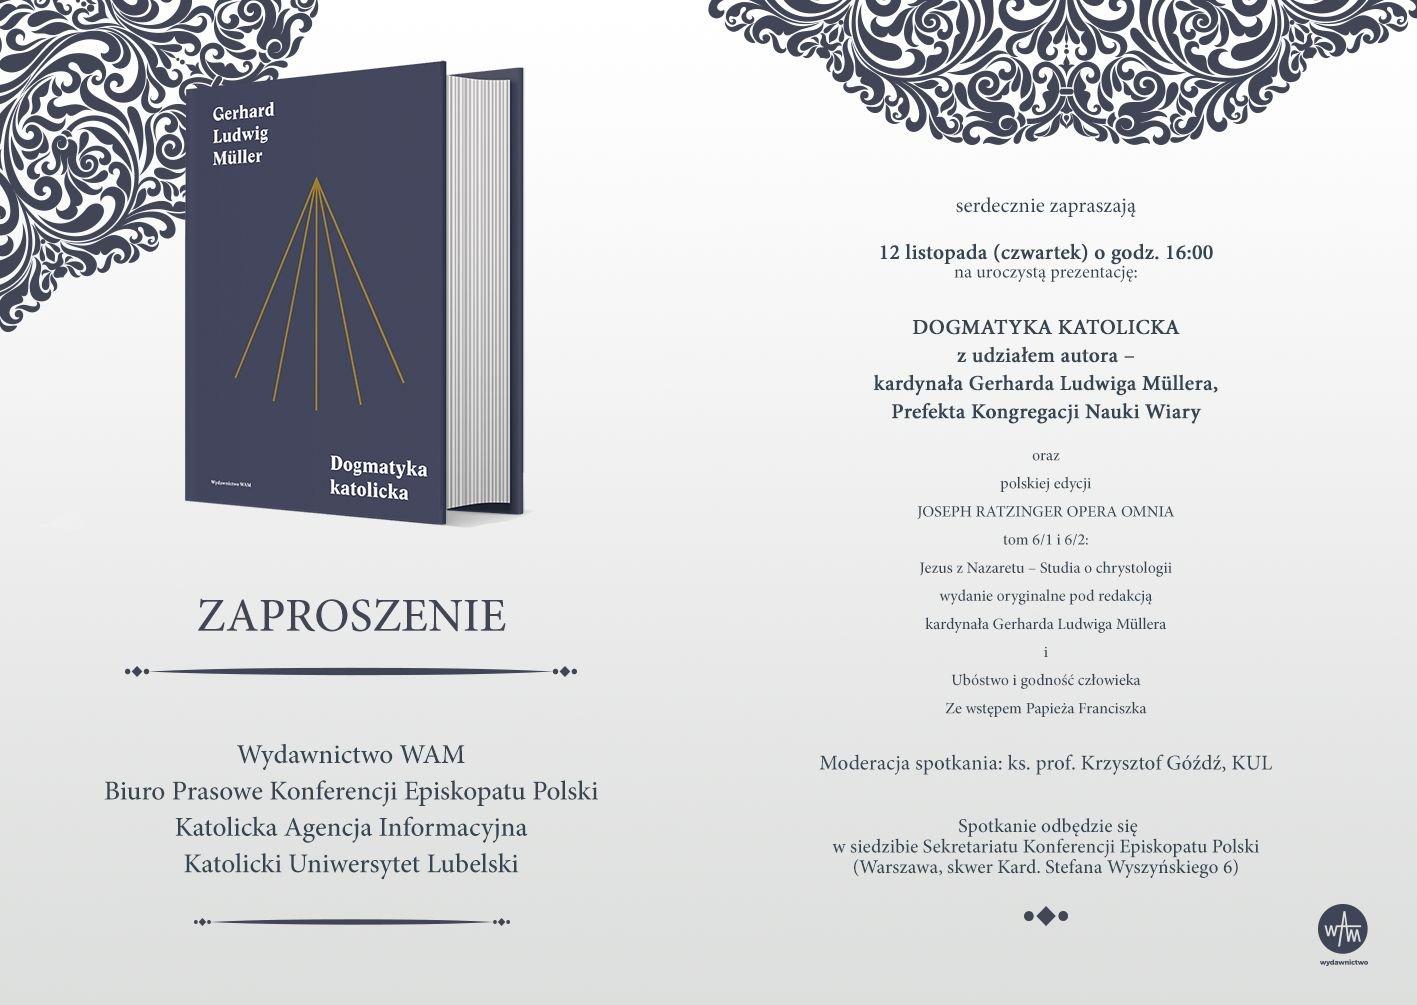 zaproszenie_ksiazka (1)